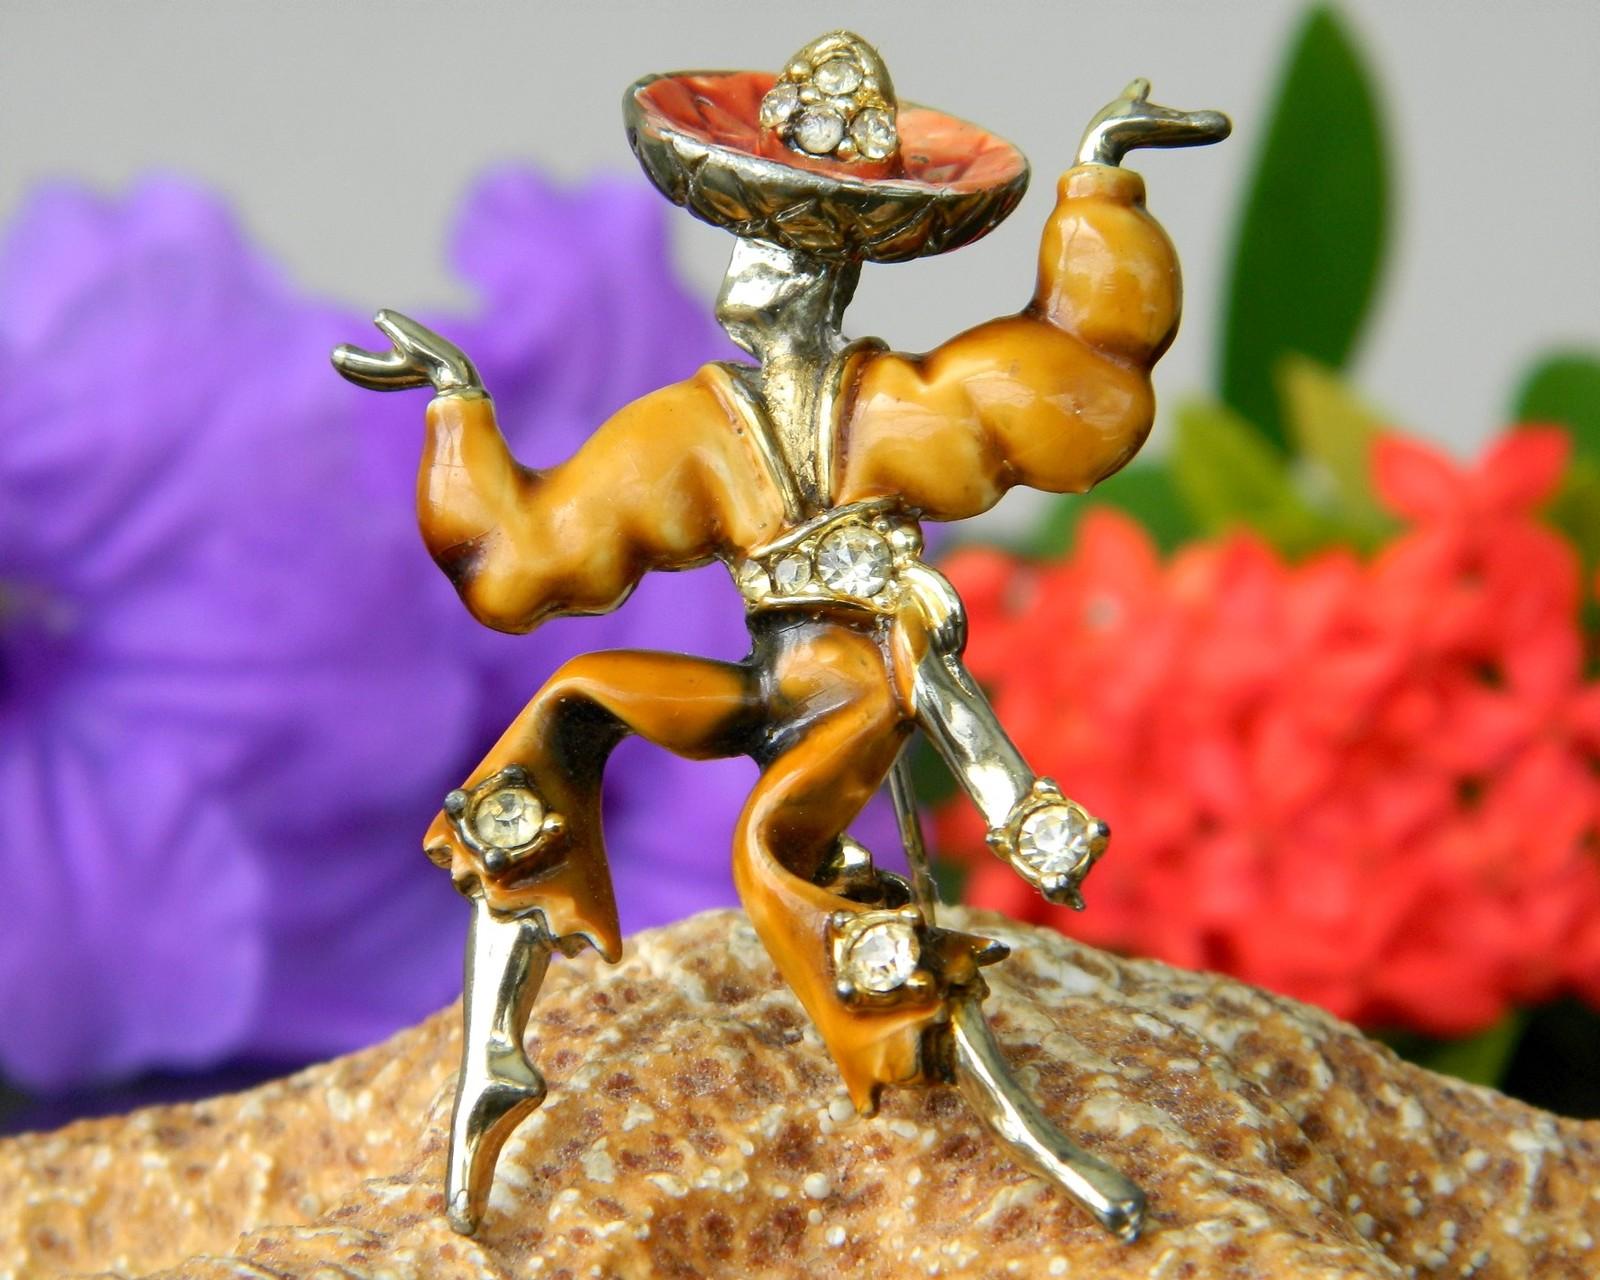 Vintage Rumba Flamenco Spanish Dancer Brooch Pin Enamel Rhinestones - $14.95